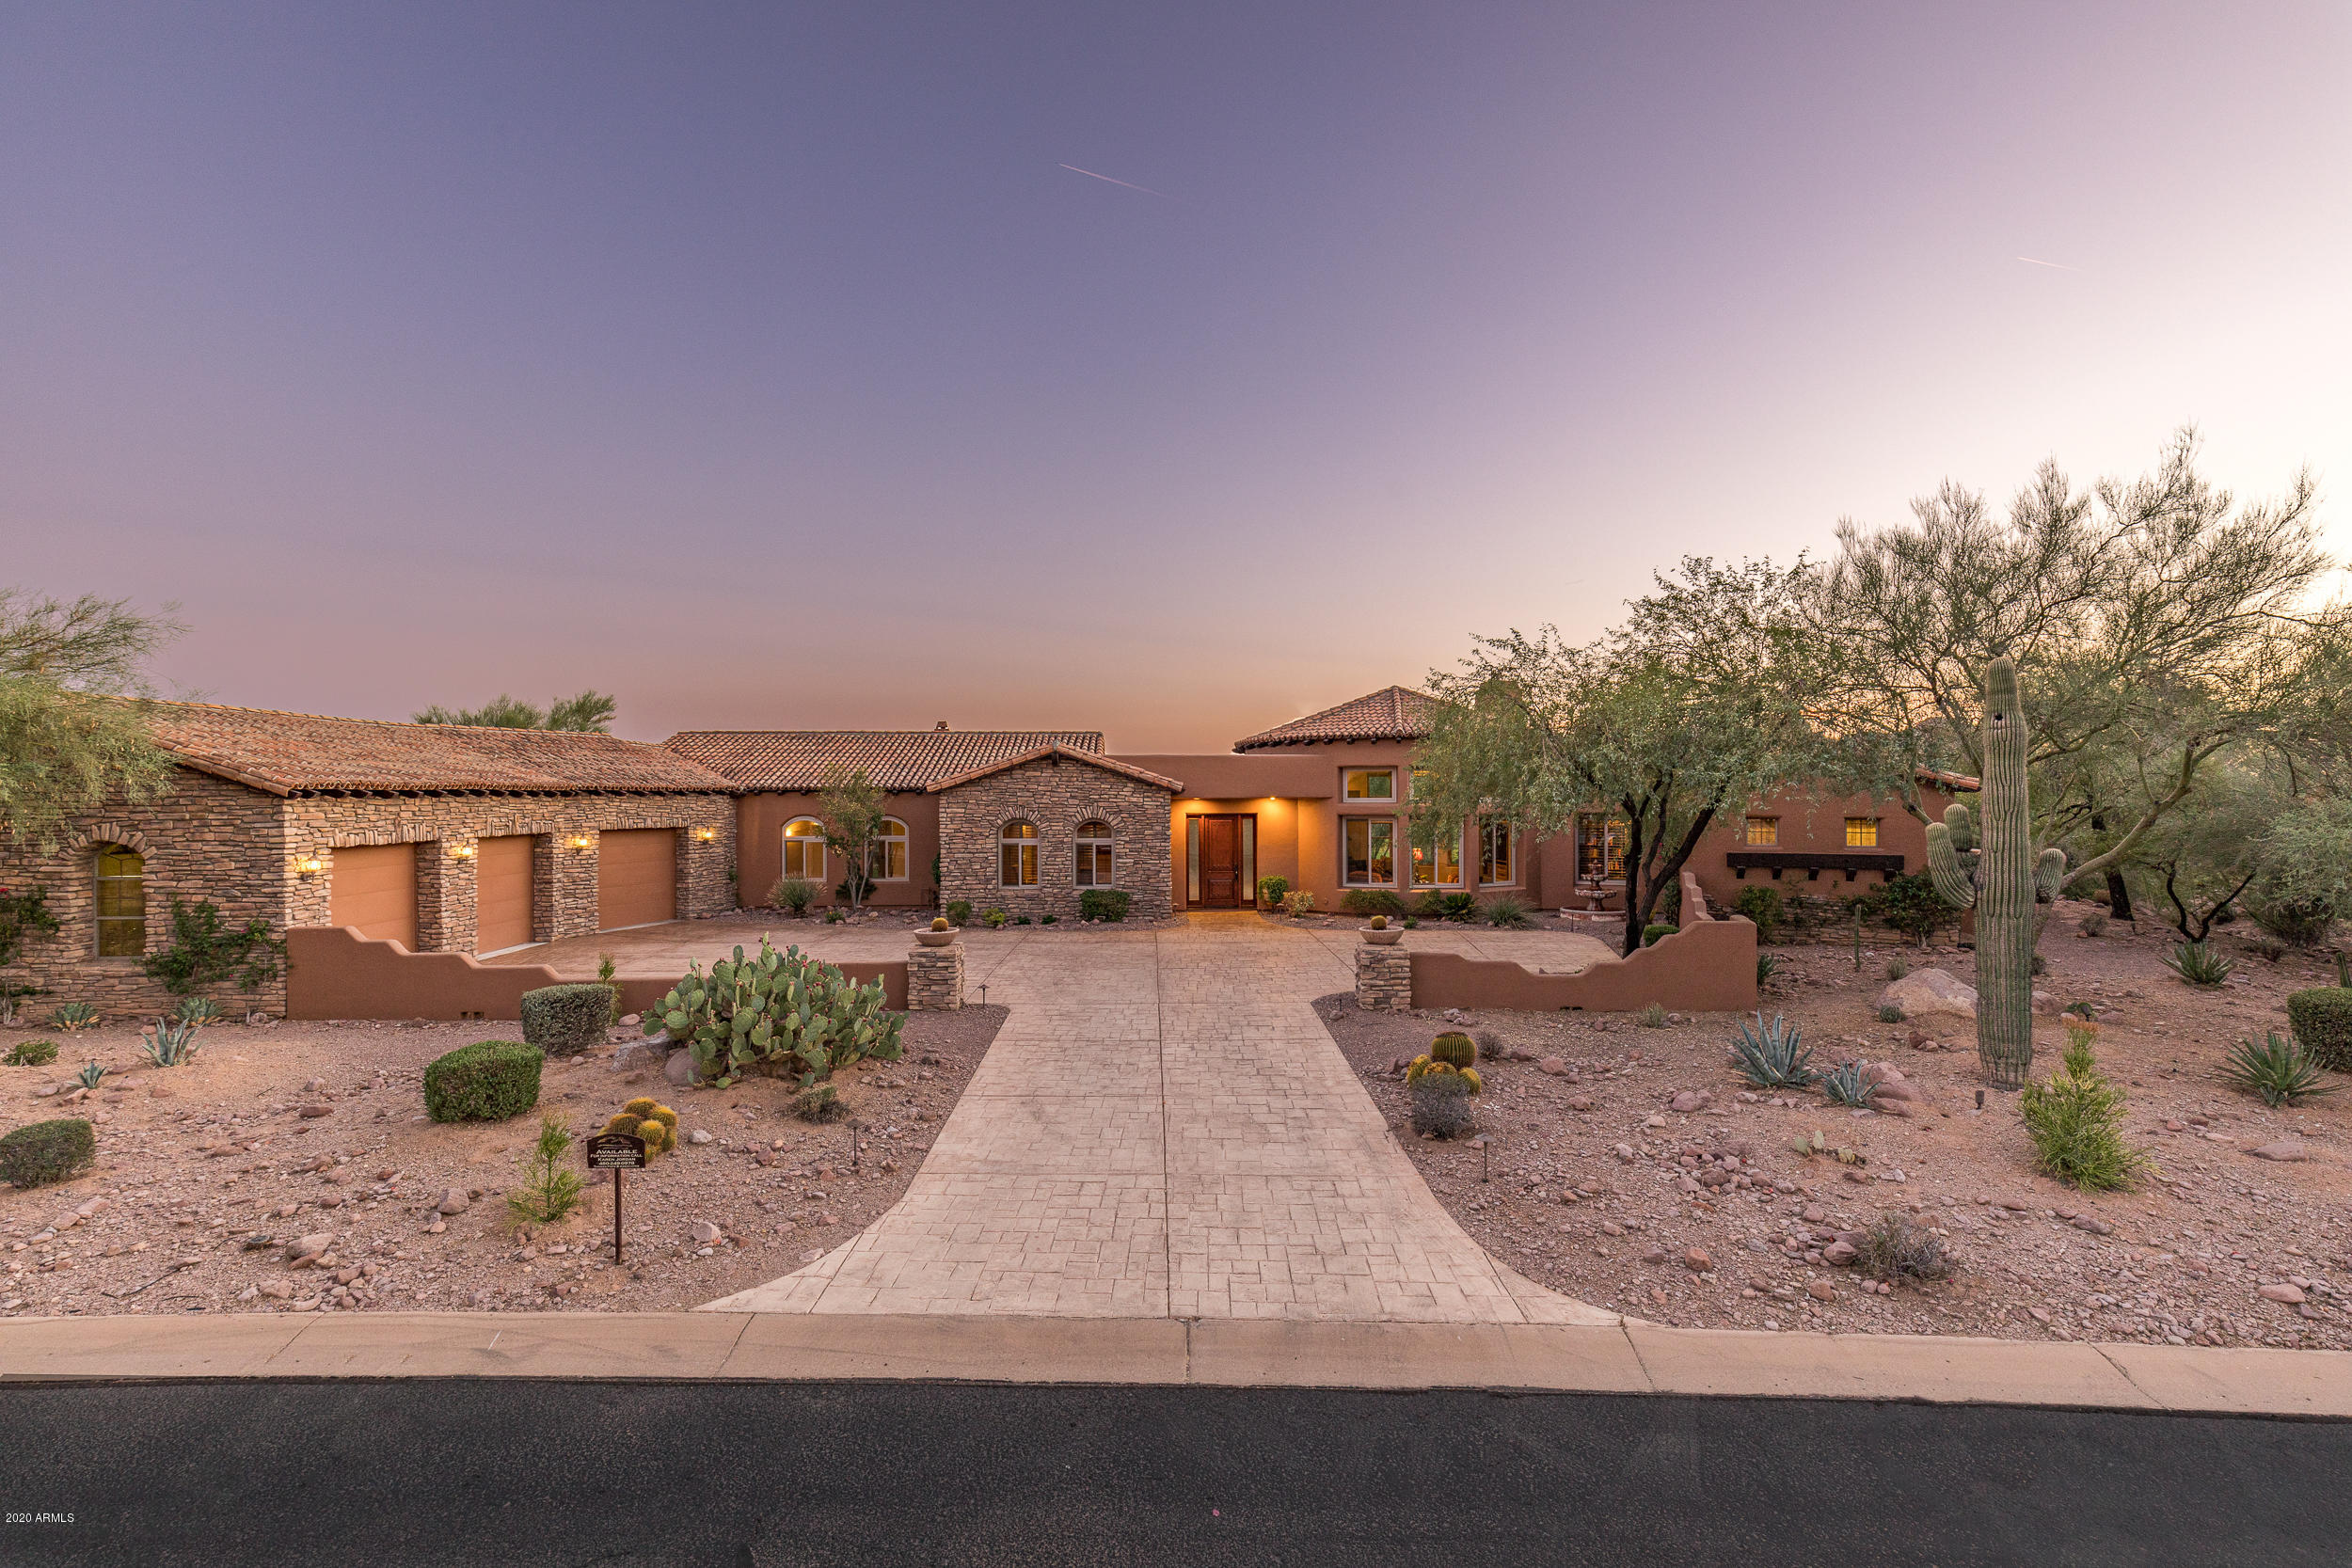 MLS 6131700 7081 E JUNIPER VILLAGE Drive, Gold Canyon, AZ 85118 Gold Canyon AZ Three Bedroom